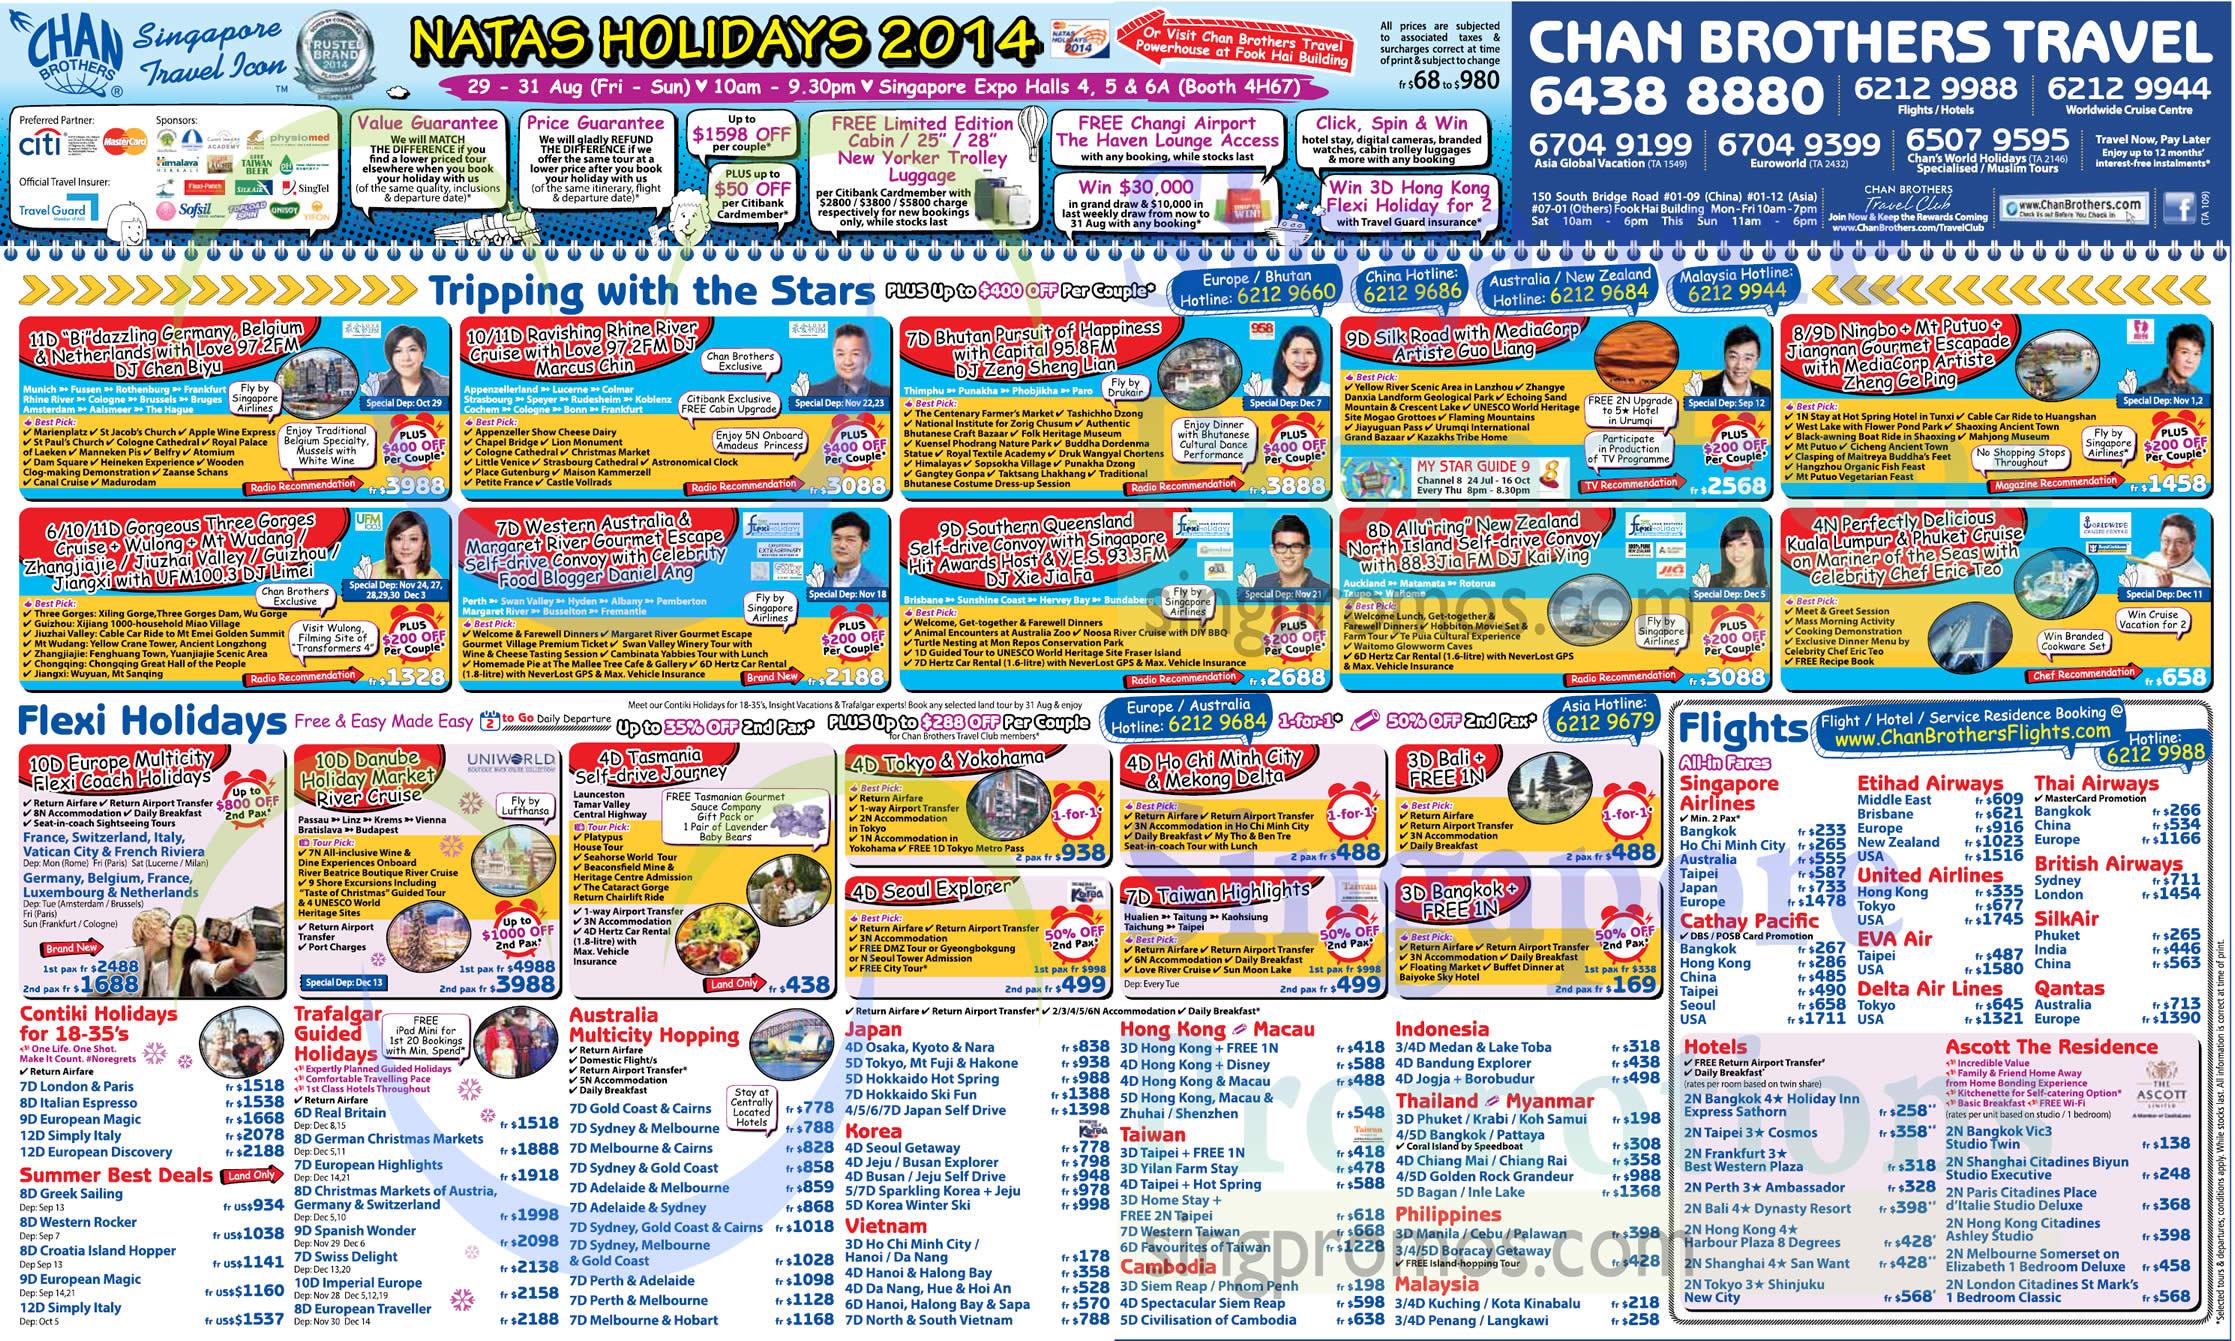 28 Aug Chan Brothers Australia, Japan, Korea, Vietnam, HongKong, Macau, Taiwan, Cambodia, Indonesia, Thailand, Myanmar, Philippines, Malaysia